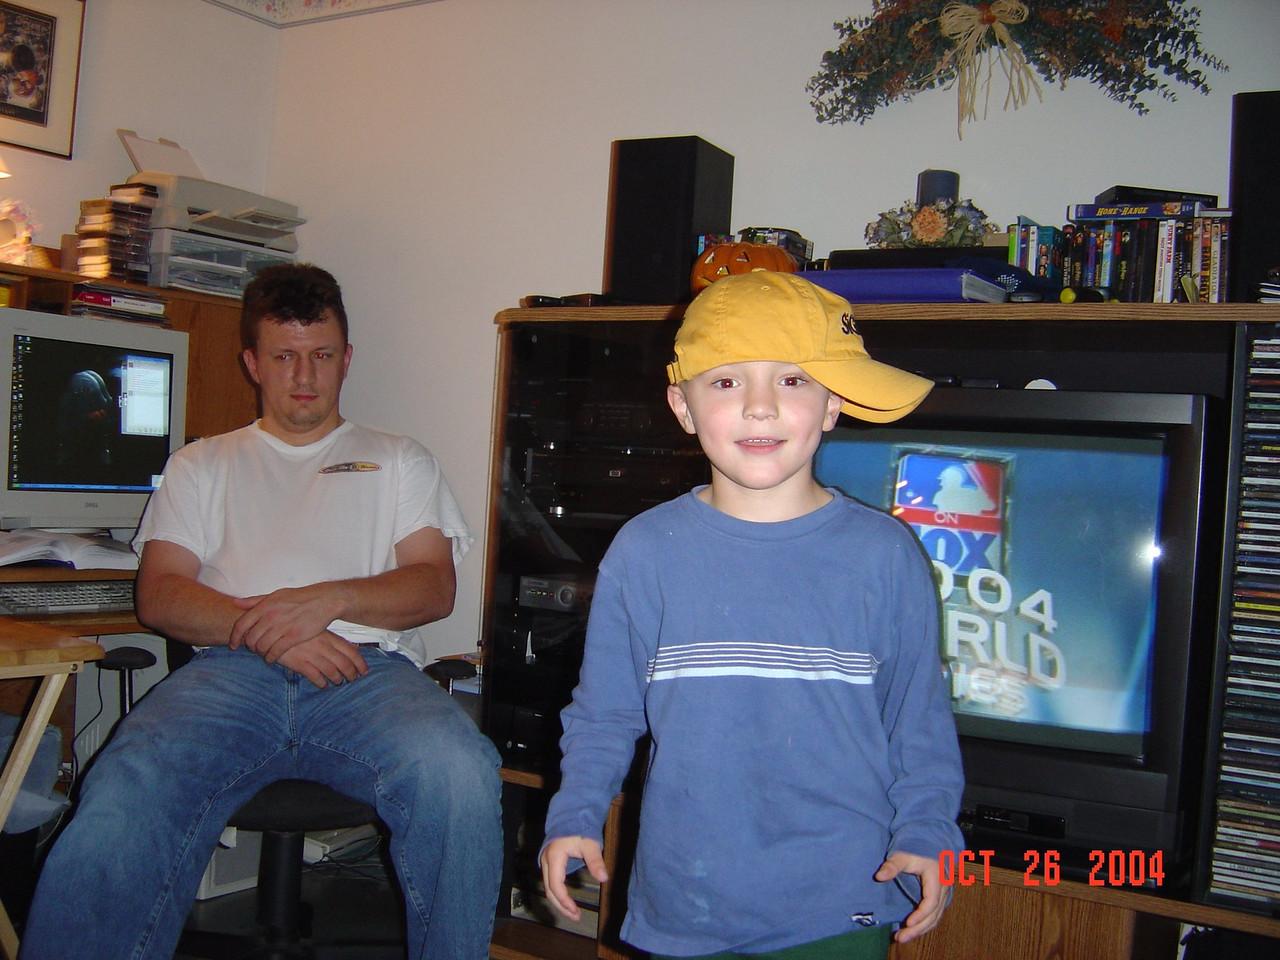 HOMEY_Tyler_10-26-2004